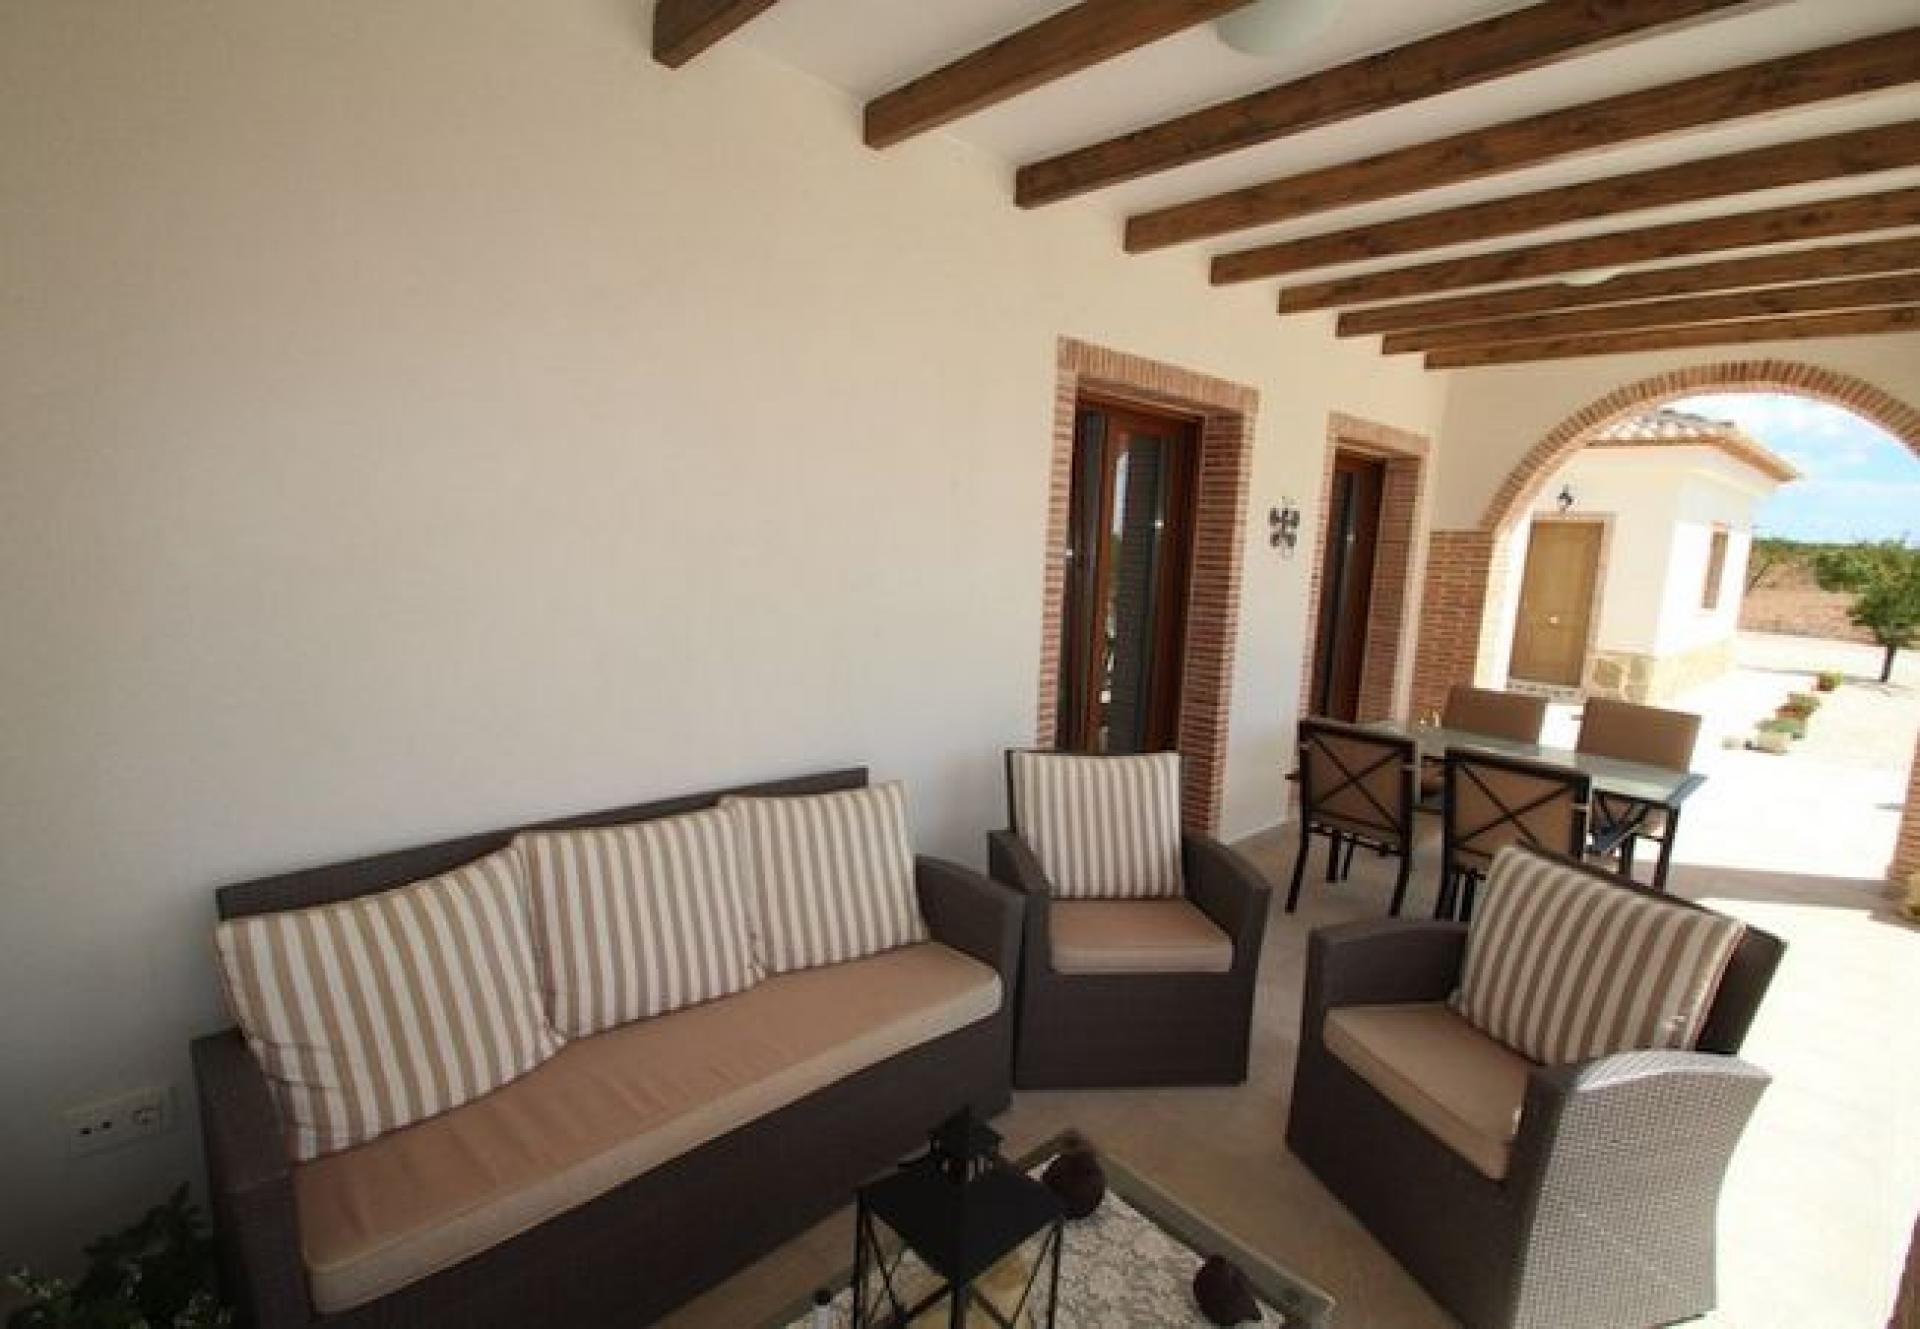 New build off-plan villa in Costa Blanca in Medvilla Spanje